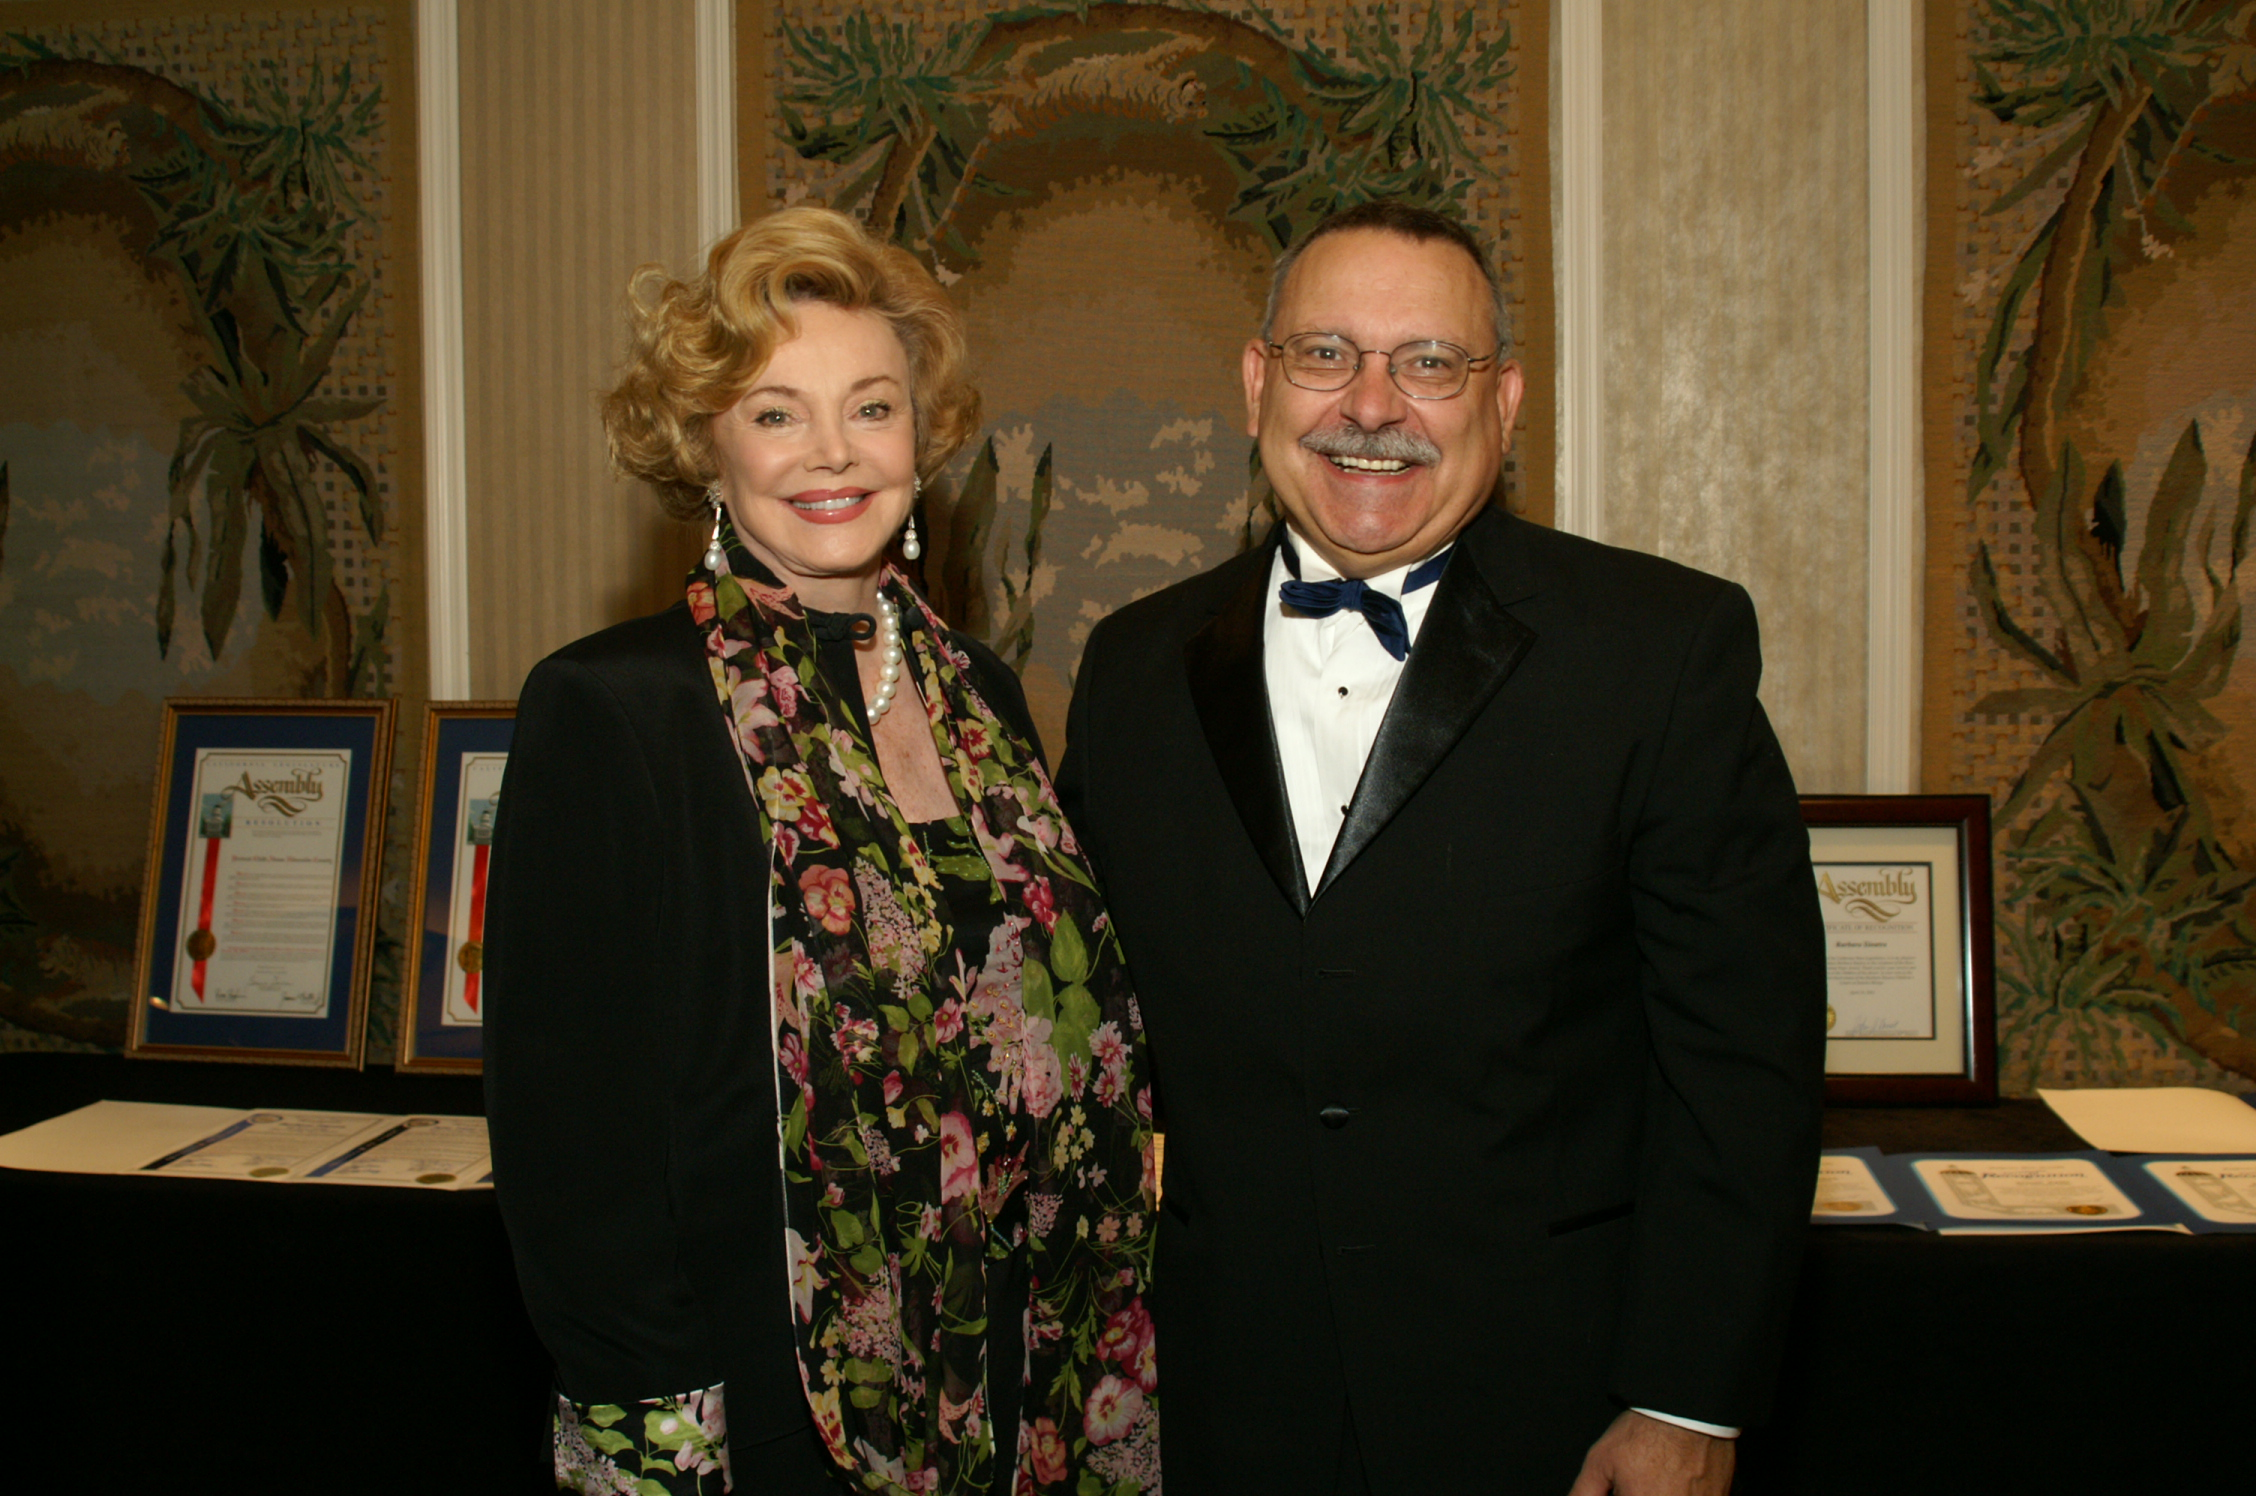 Mike & Barbara Sinatra